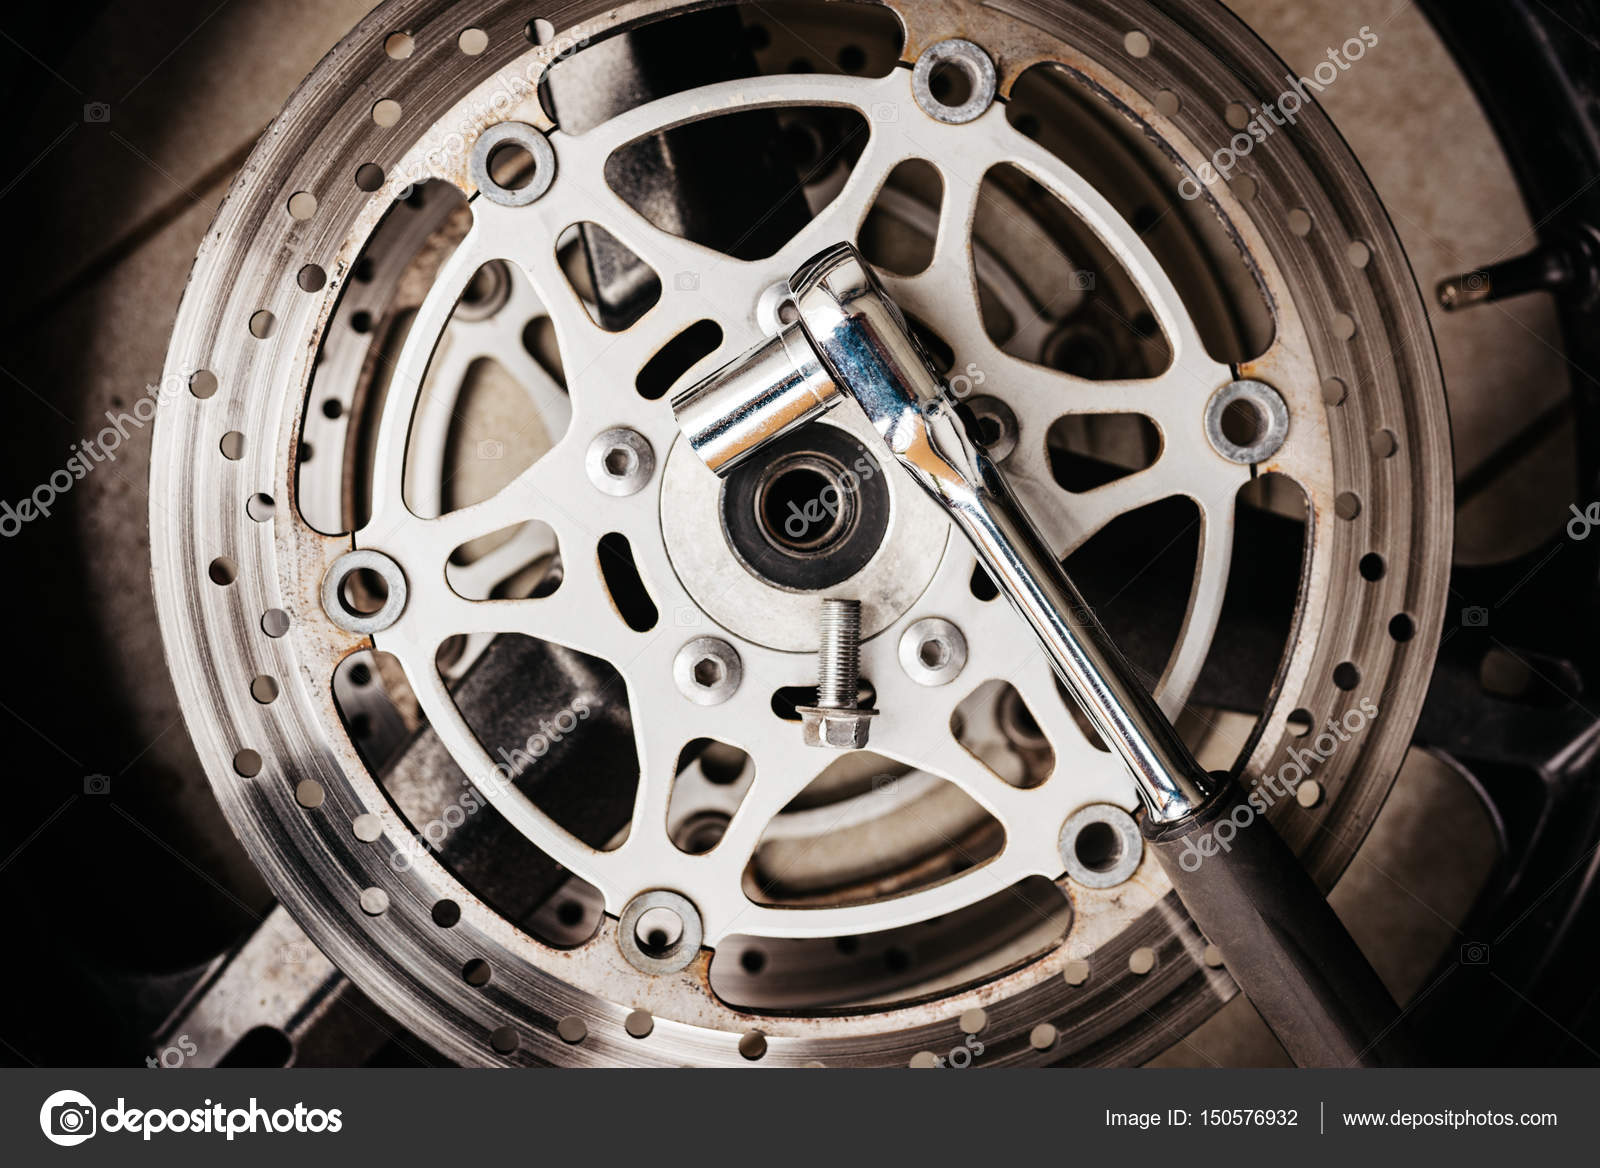 Metal Wrench On Motorcycle Disk Brake Stock Photo C Djedzura 150576932